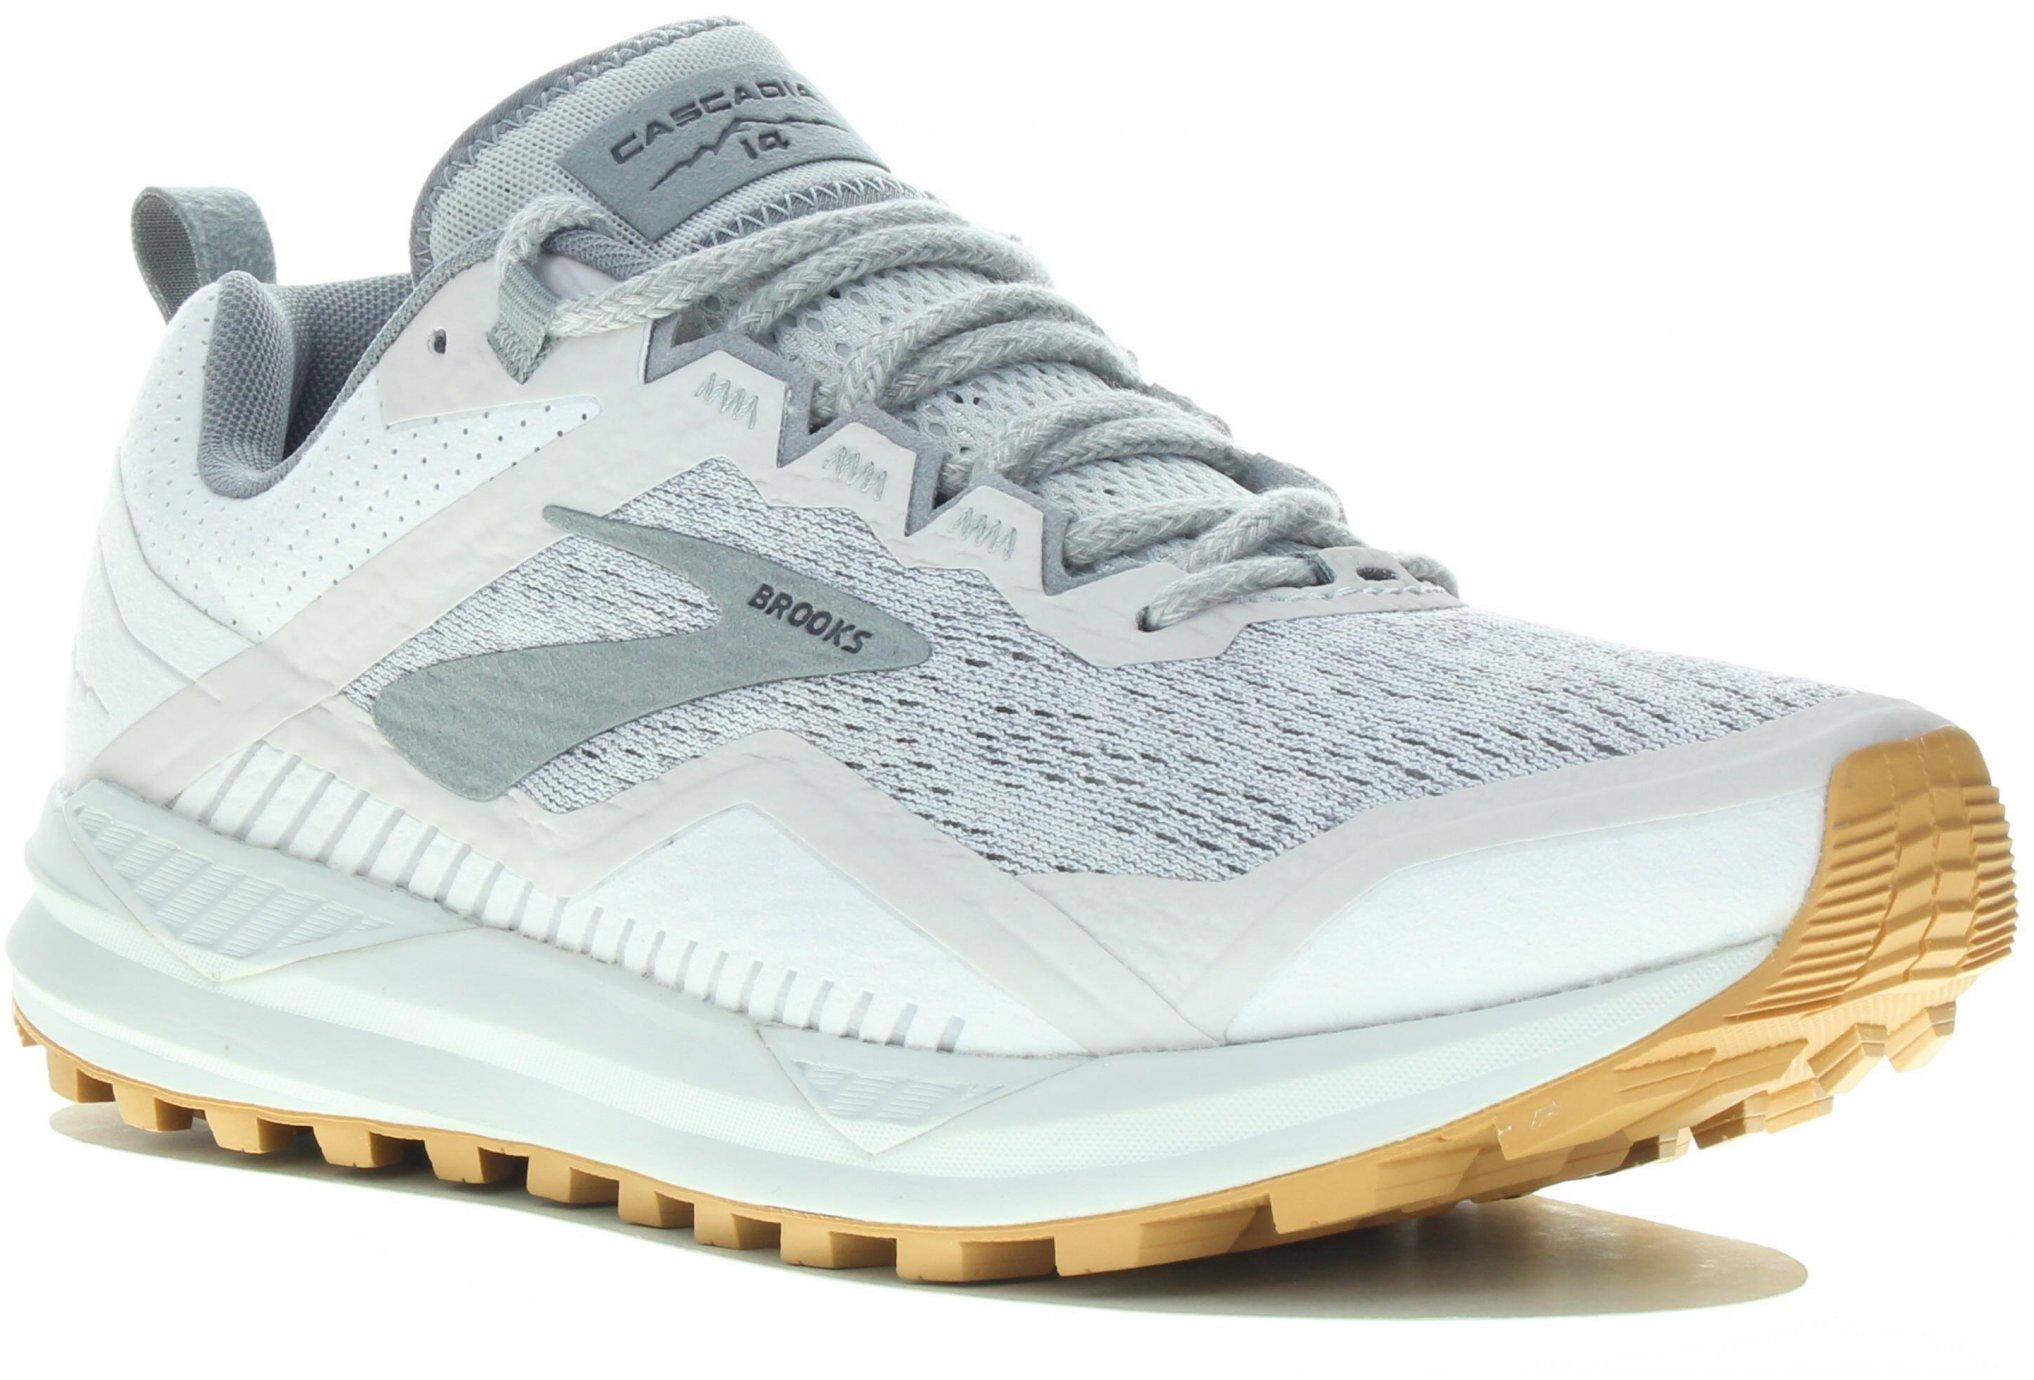 Brooks Cascadia 14 Chaussures running femme